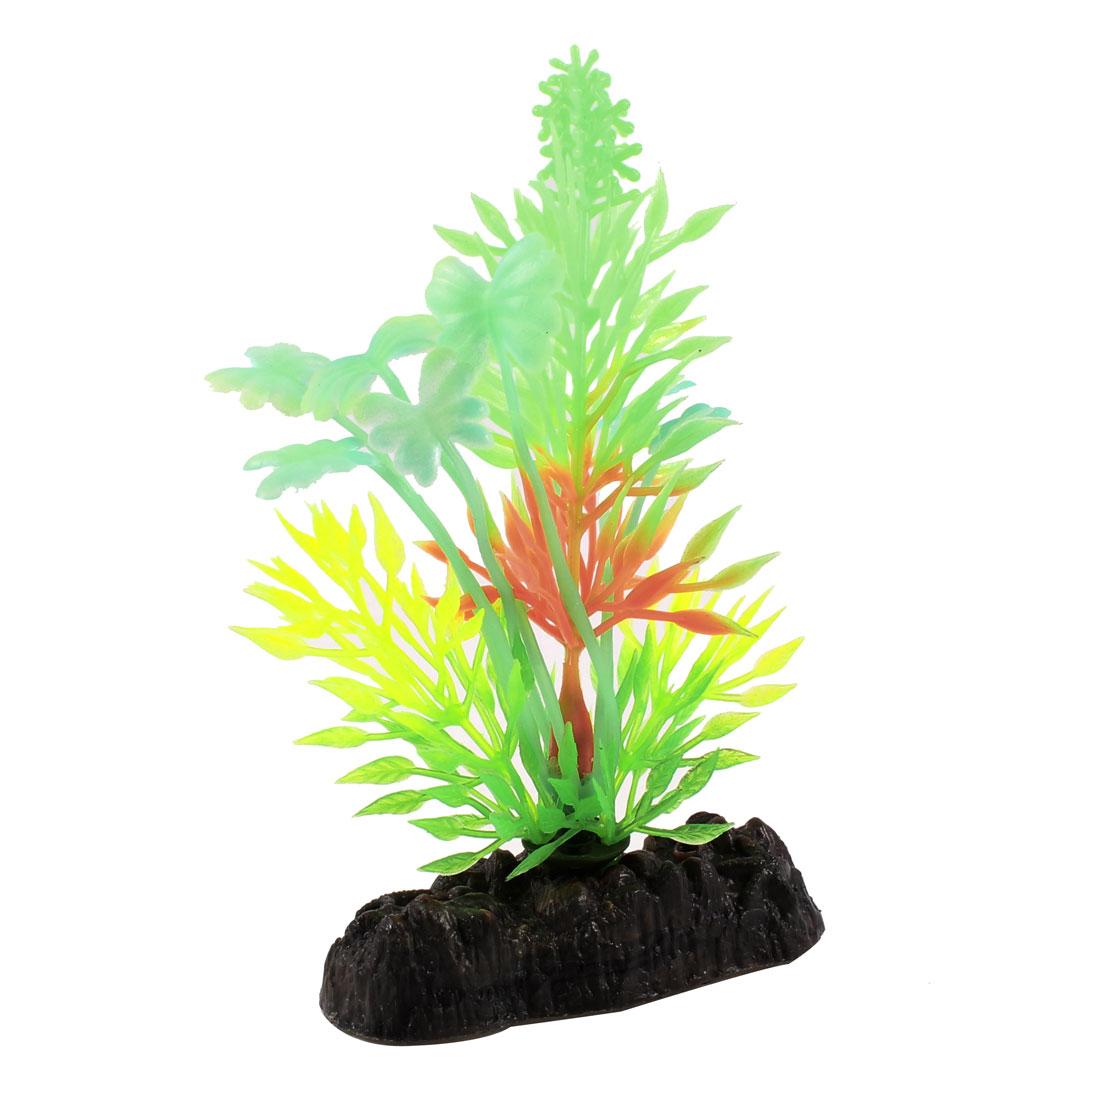 Aquarium Landscaping Colorful Artificial Luminous Plant Grass w Stone Base